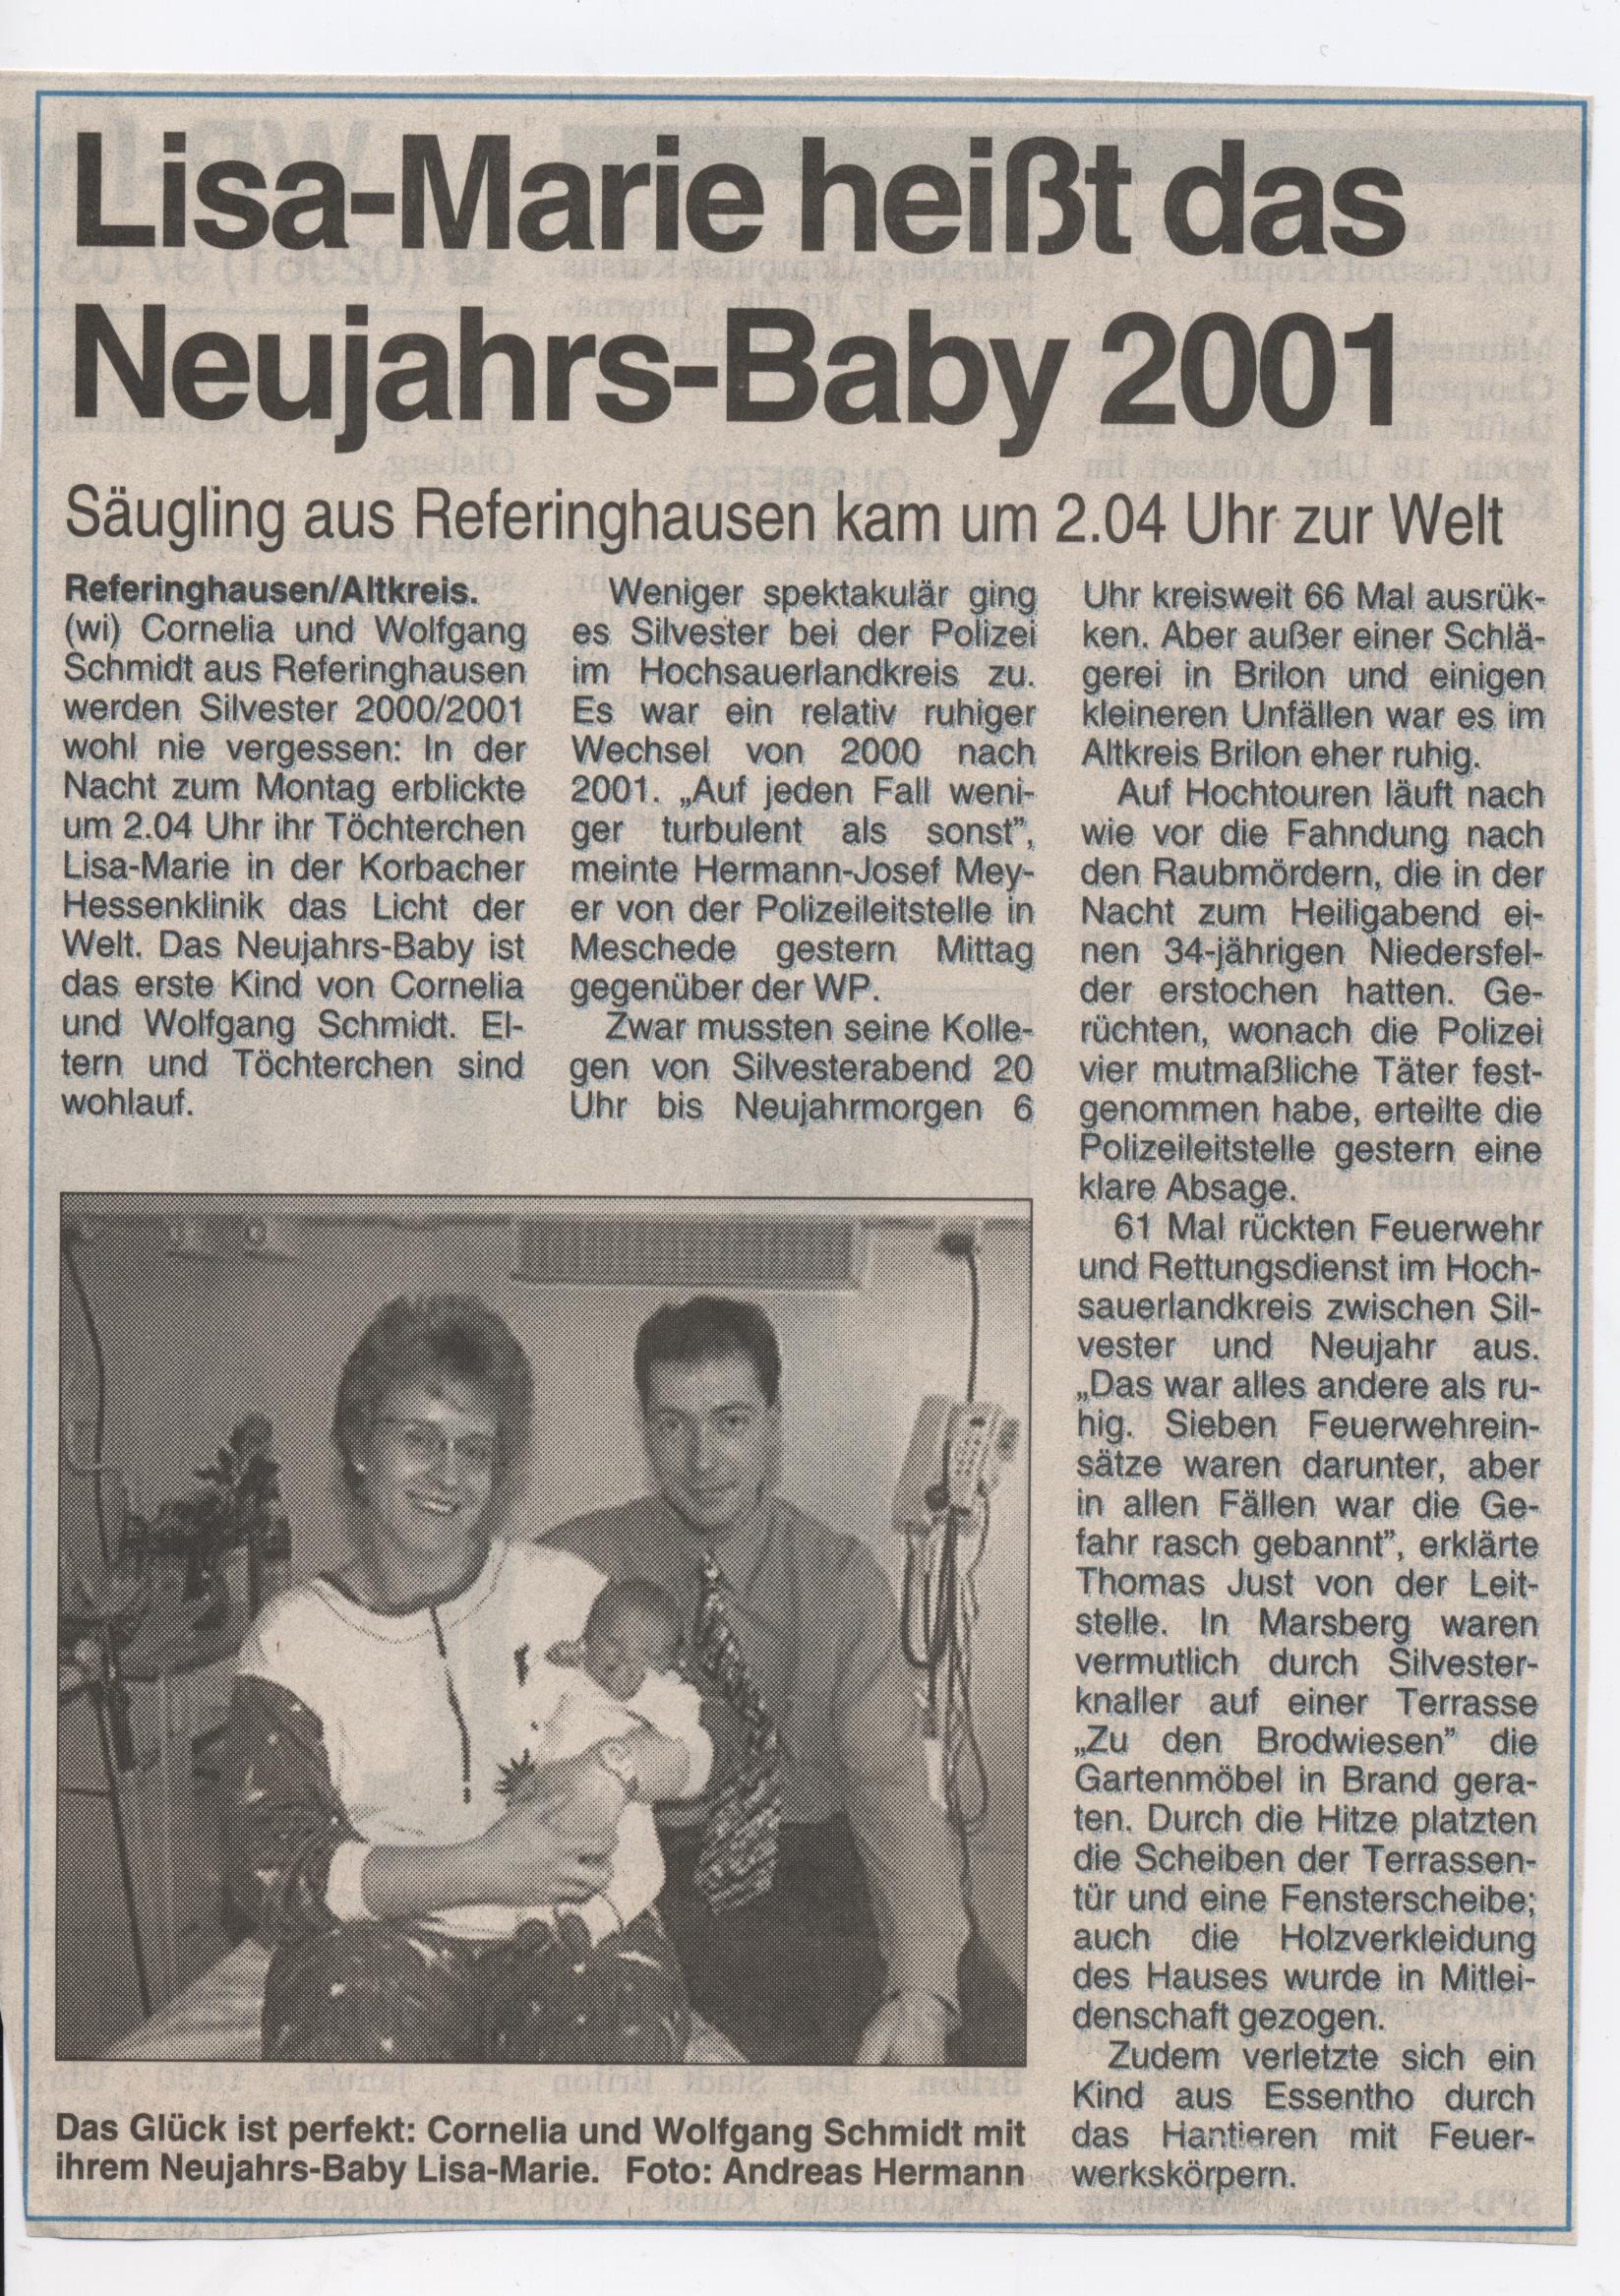 Lisa-Marie Neujahresbaby